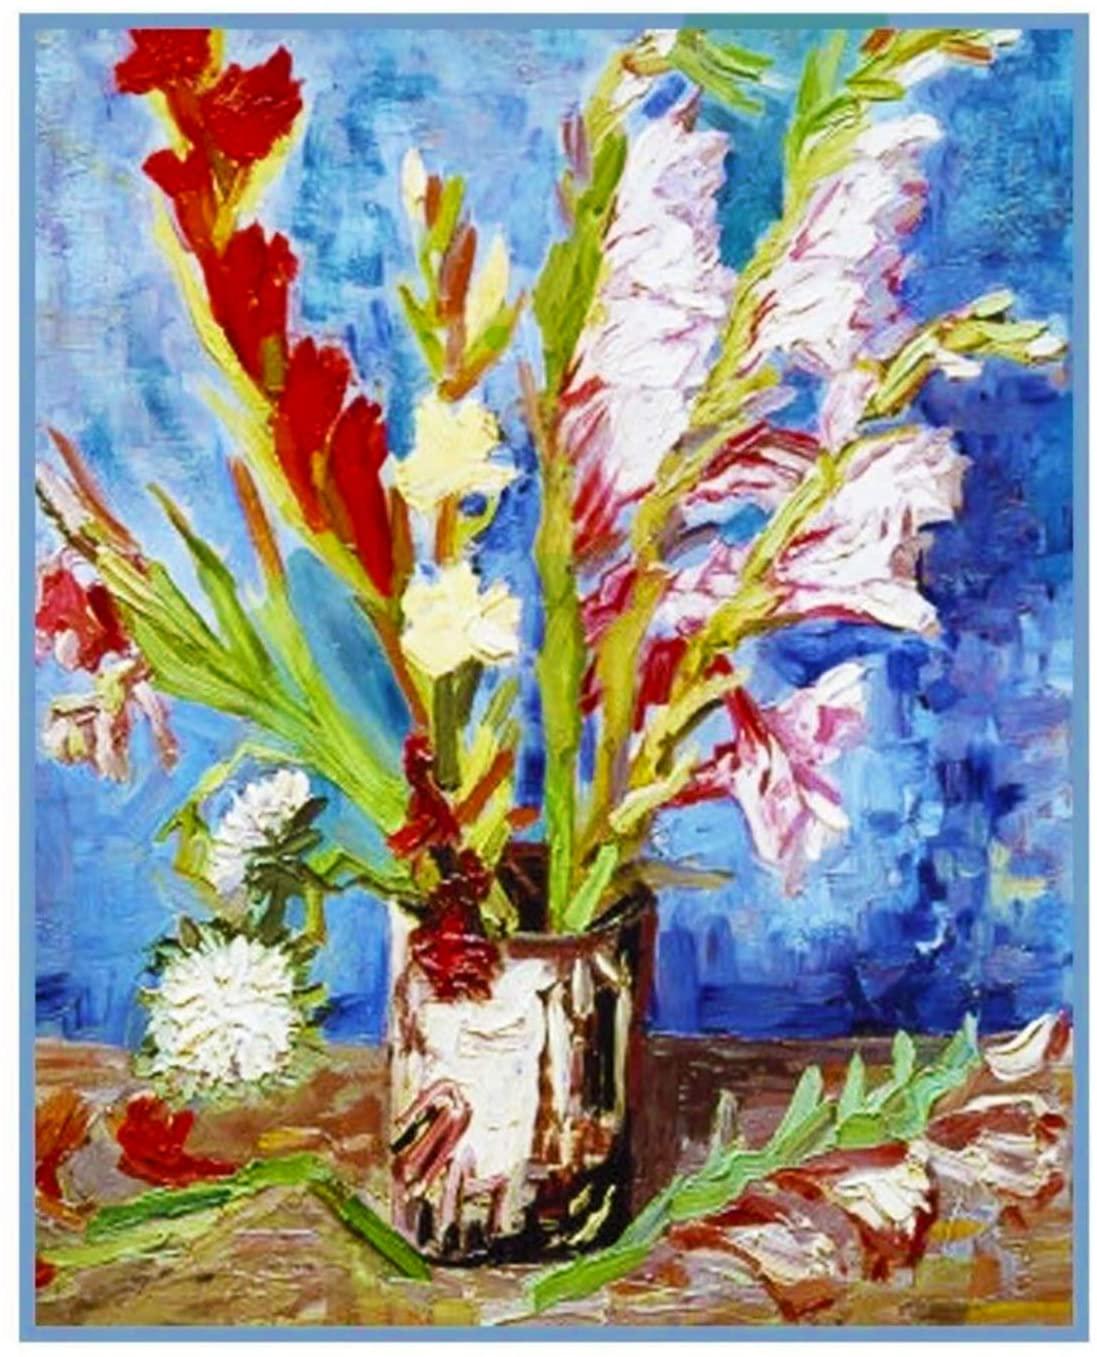 Orenco Originals Vase Red White Gladioli by Van Gogh Counted Cross Stitch Pattern